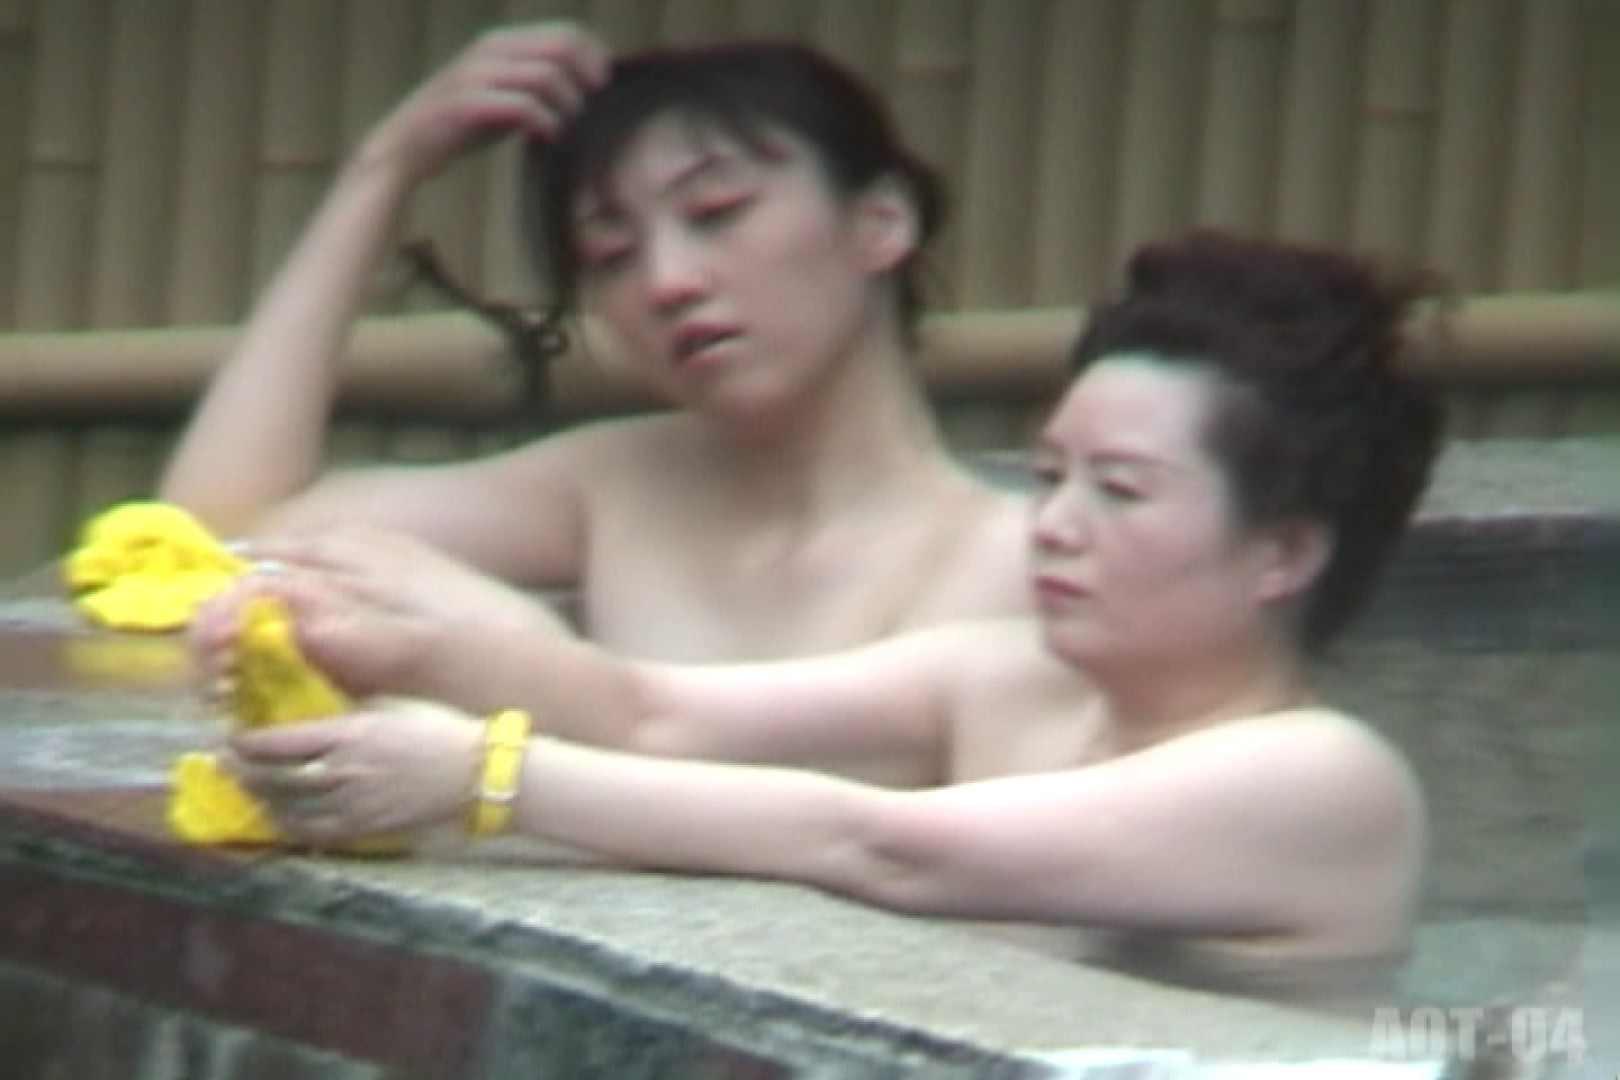 Aquaな露天風呂Vol.743 OLセックス  108画像 93